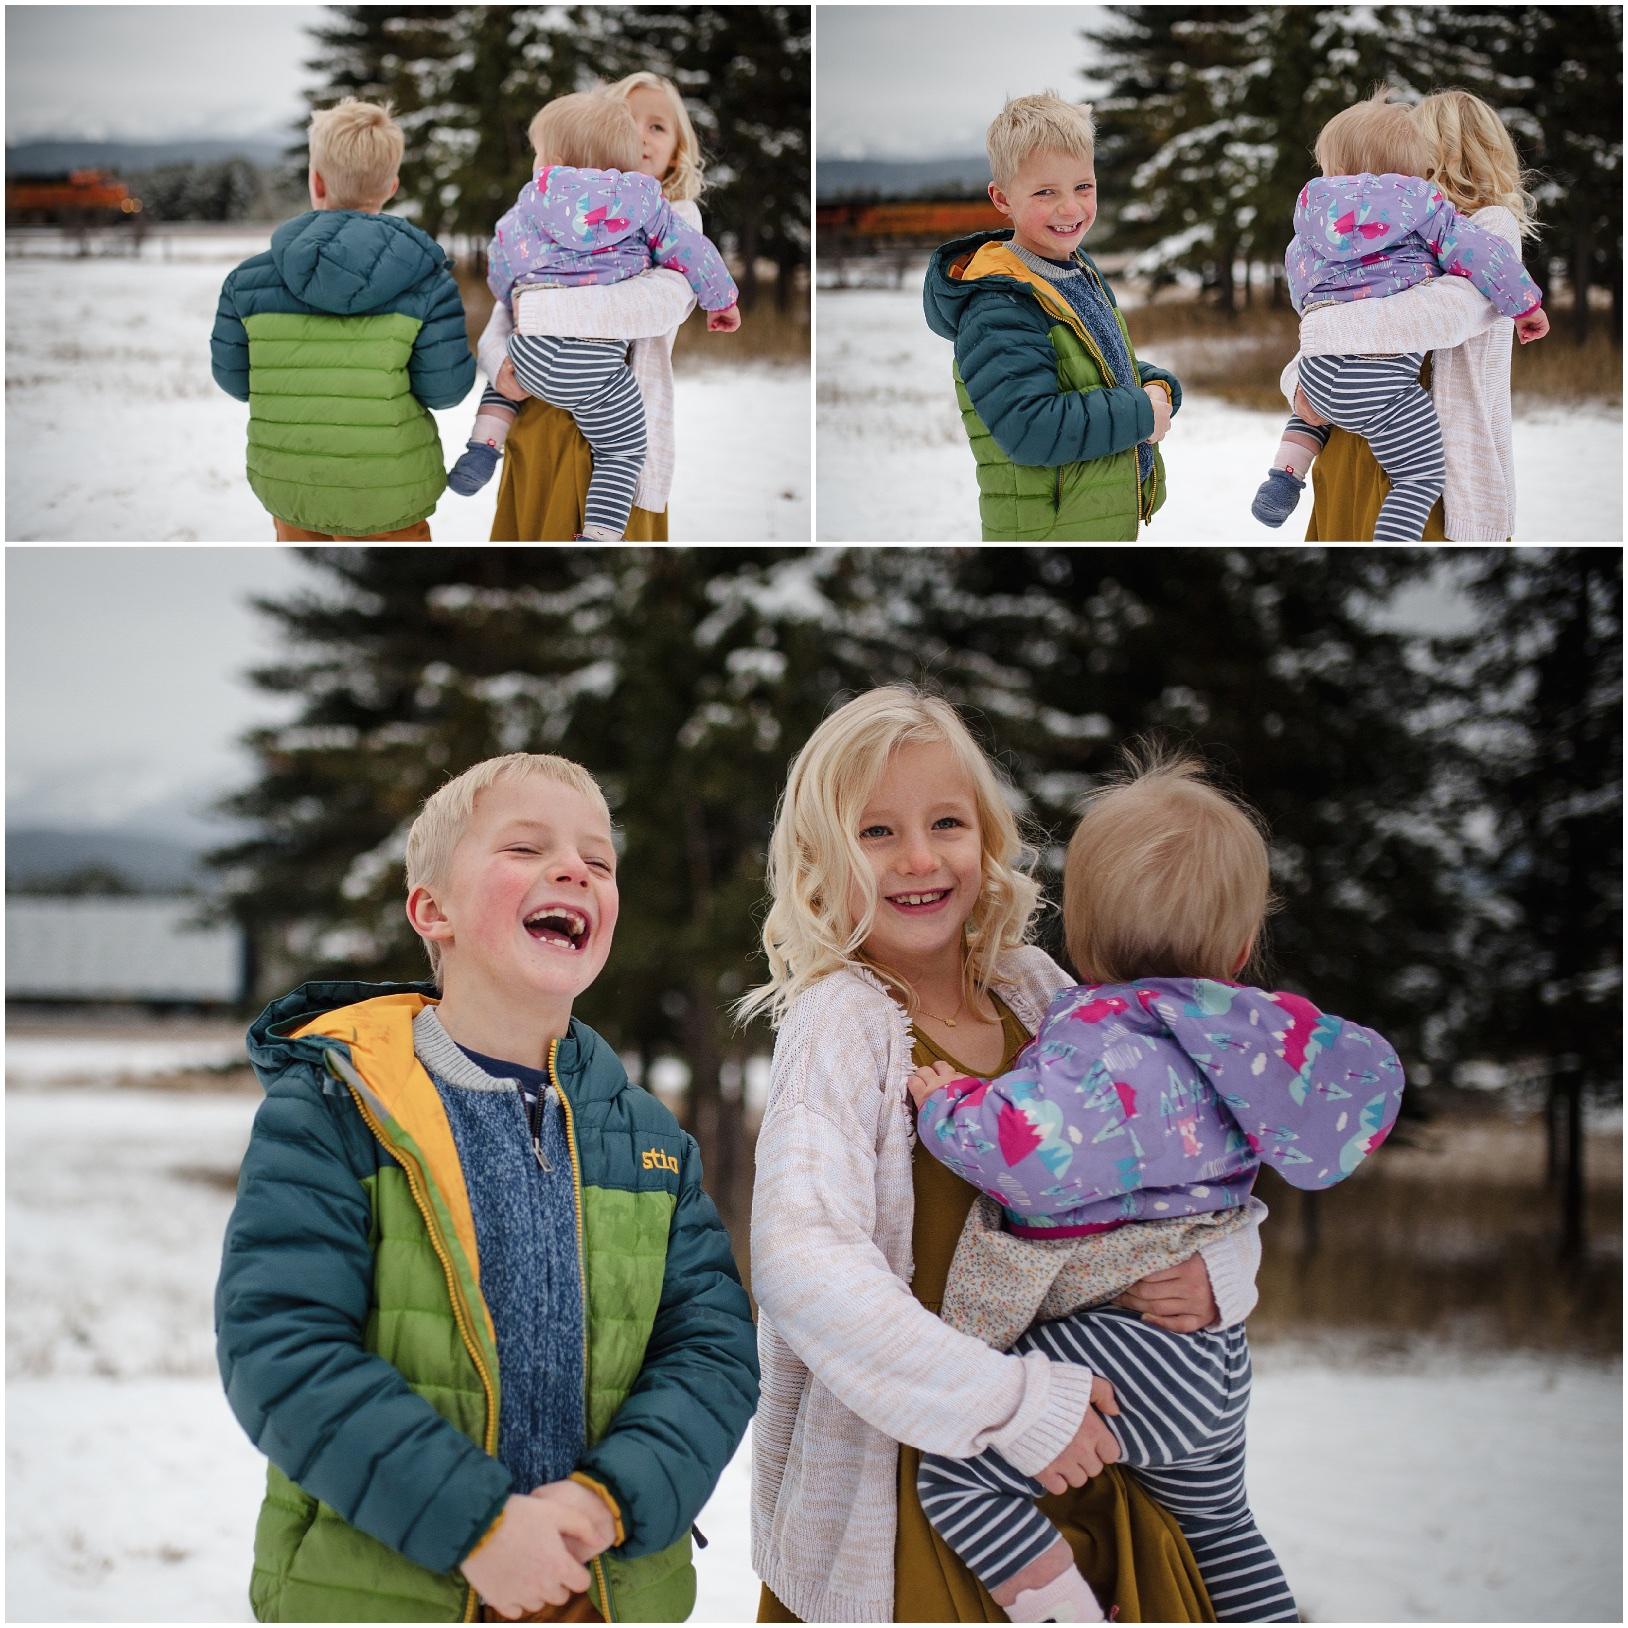 lindseyjane_family025.jpg